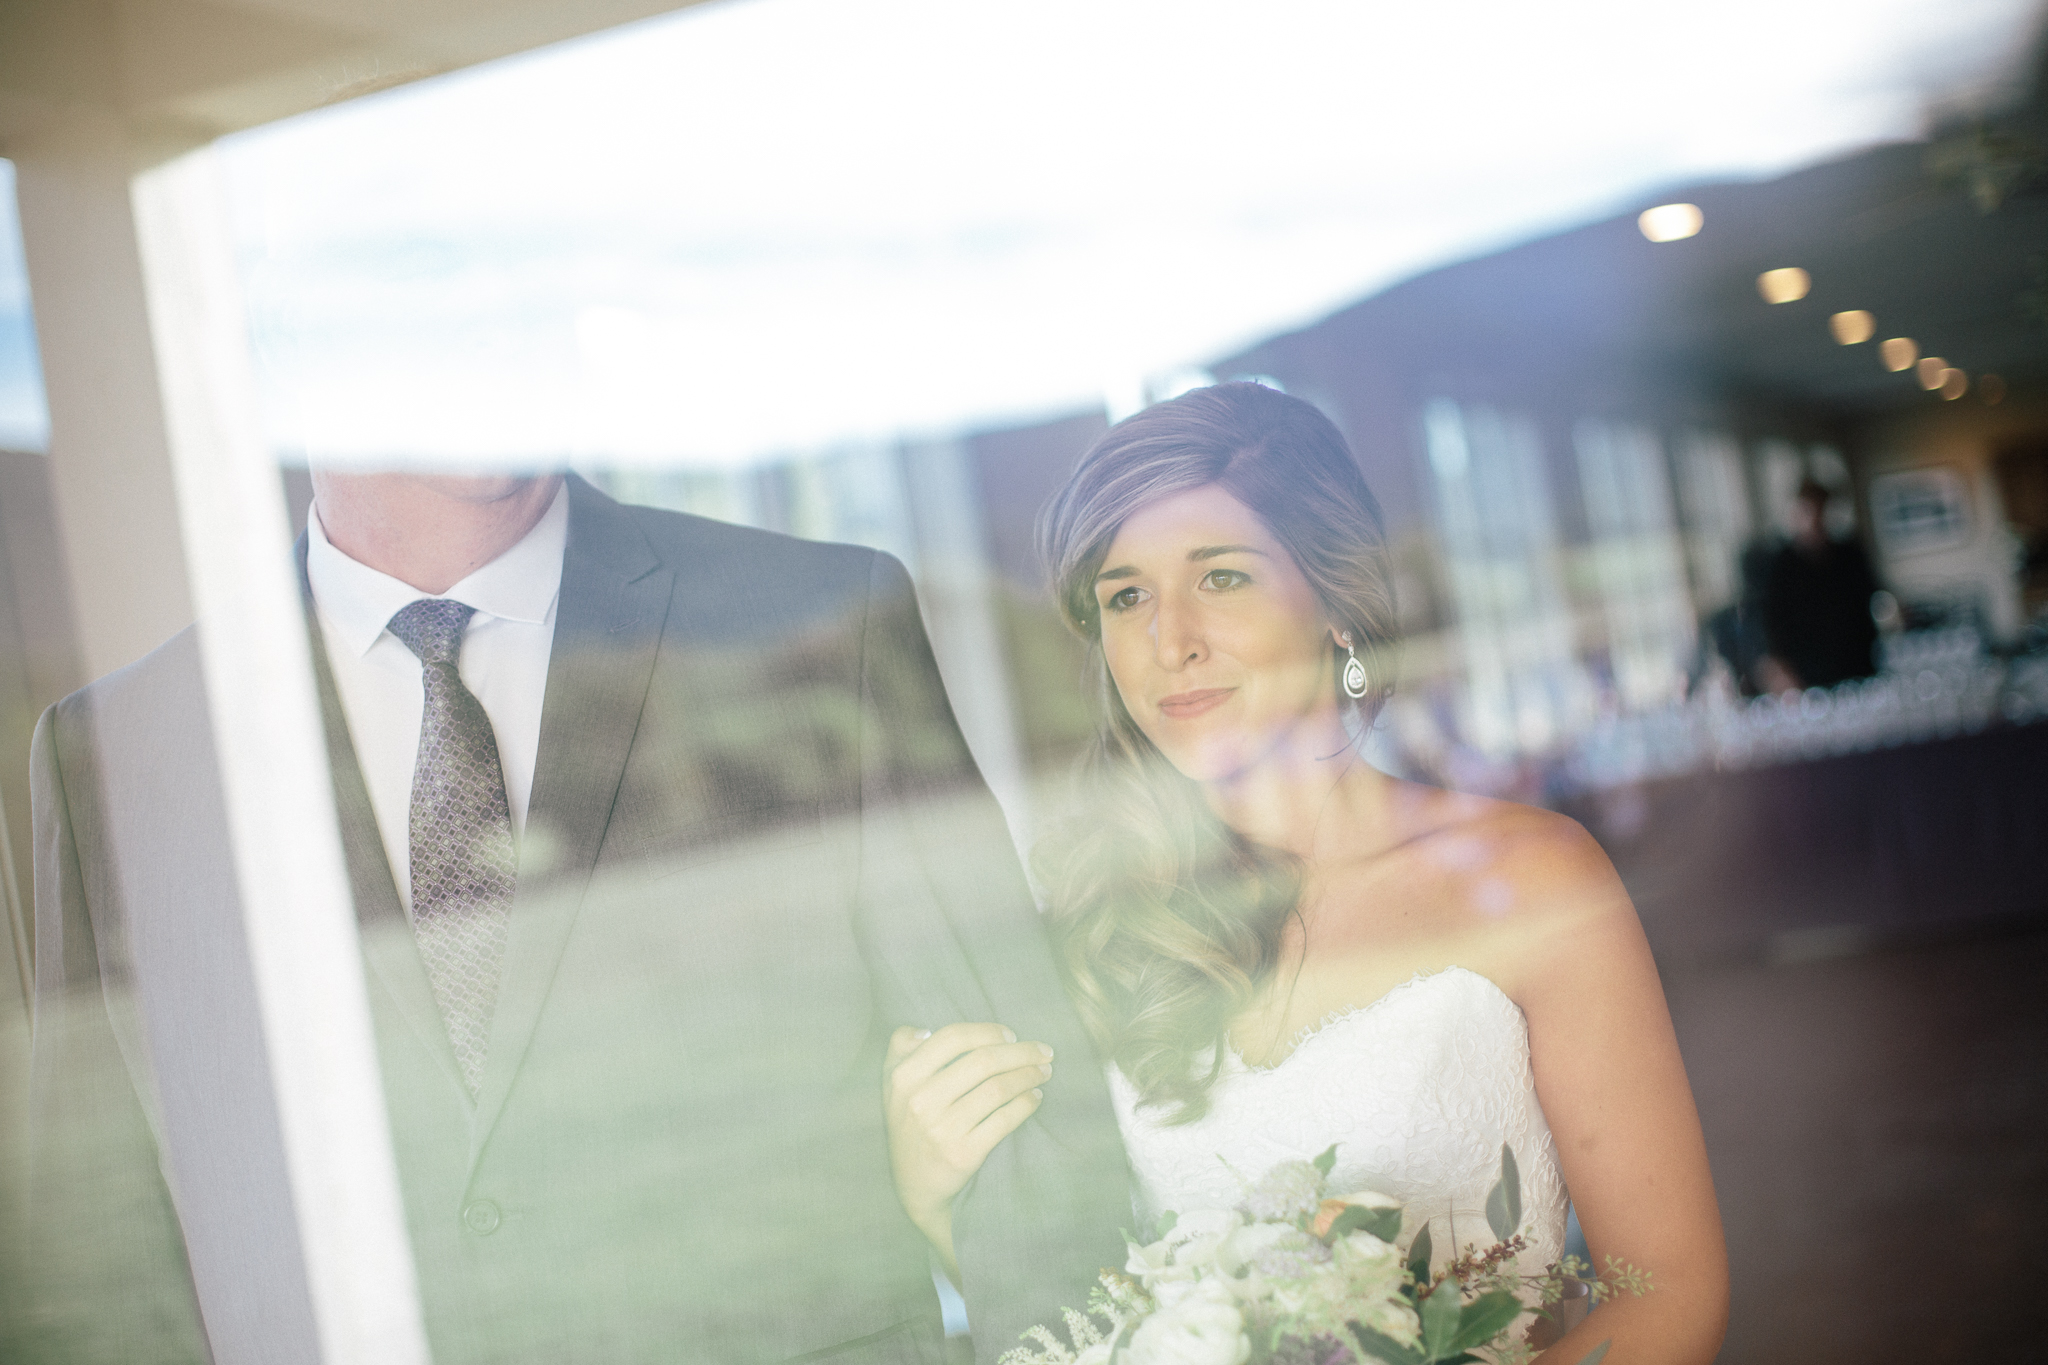 King-family-wedding-photos_20.jpg